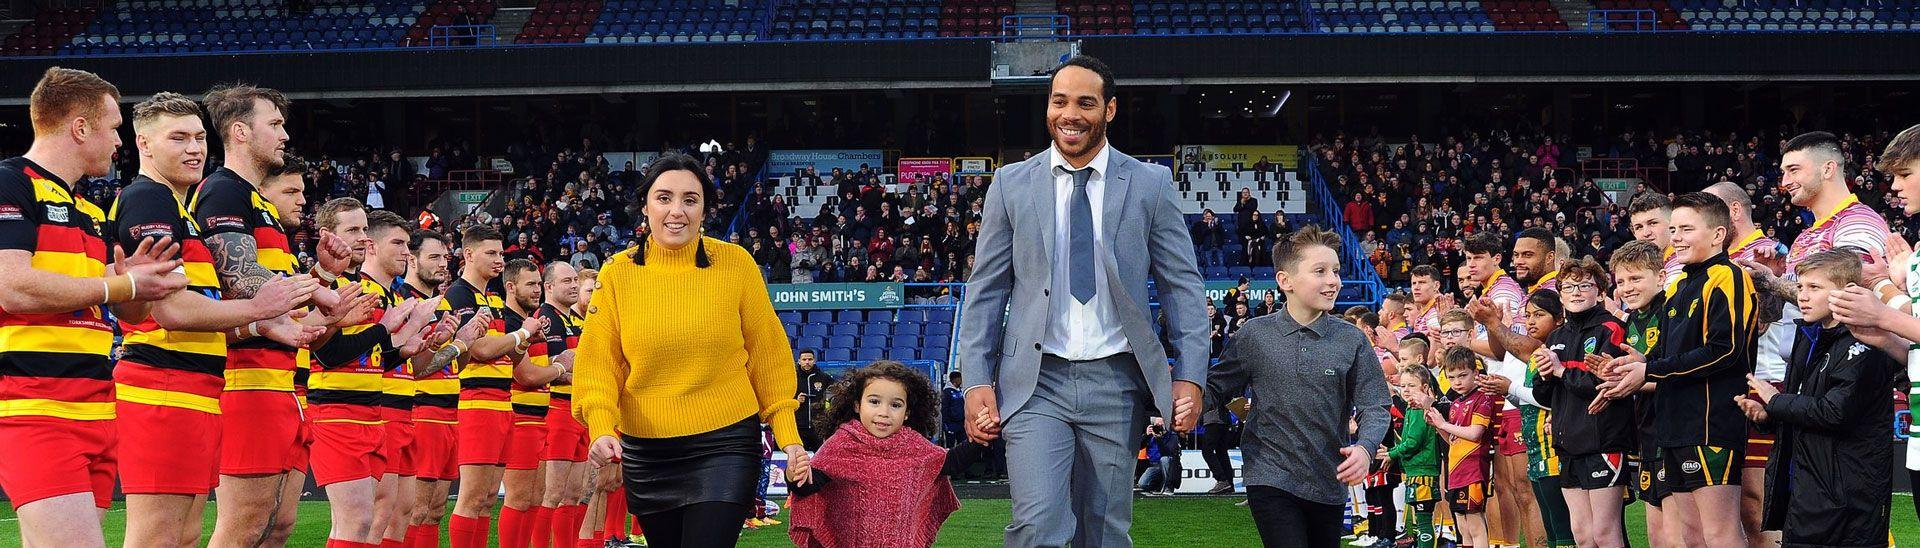 Huddersfield Giants vs Dewsbury Rams - 14/01/2018